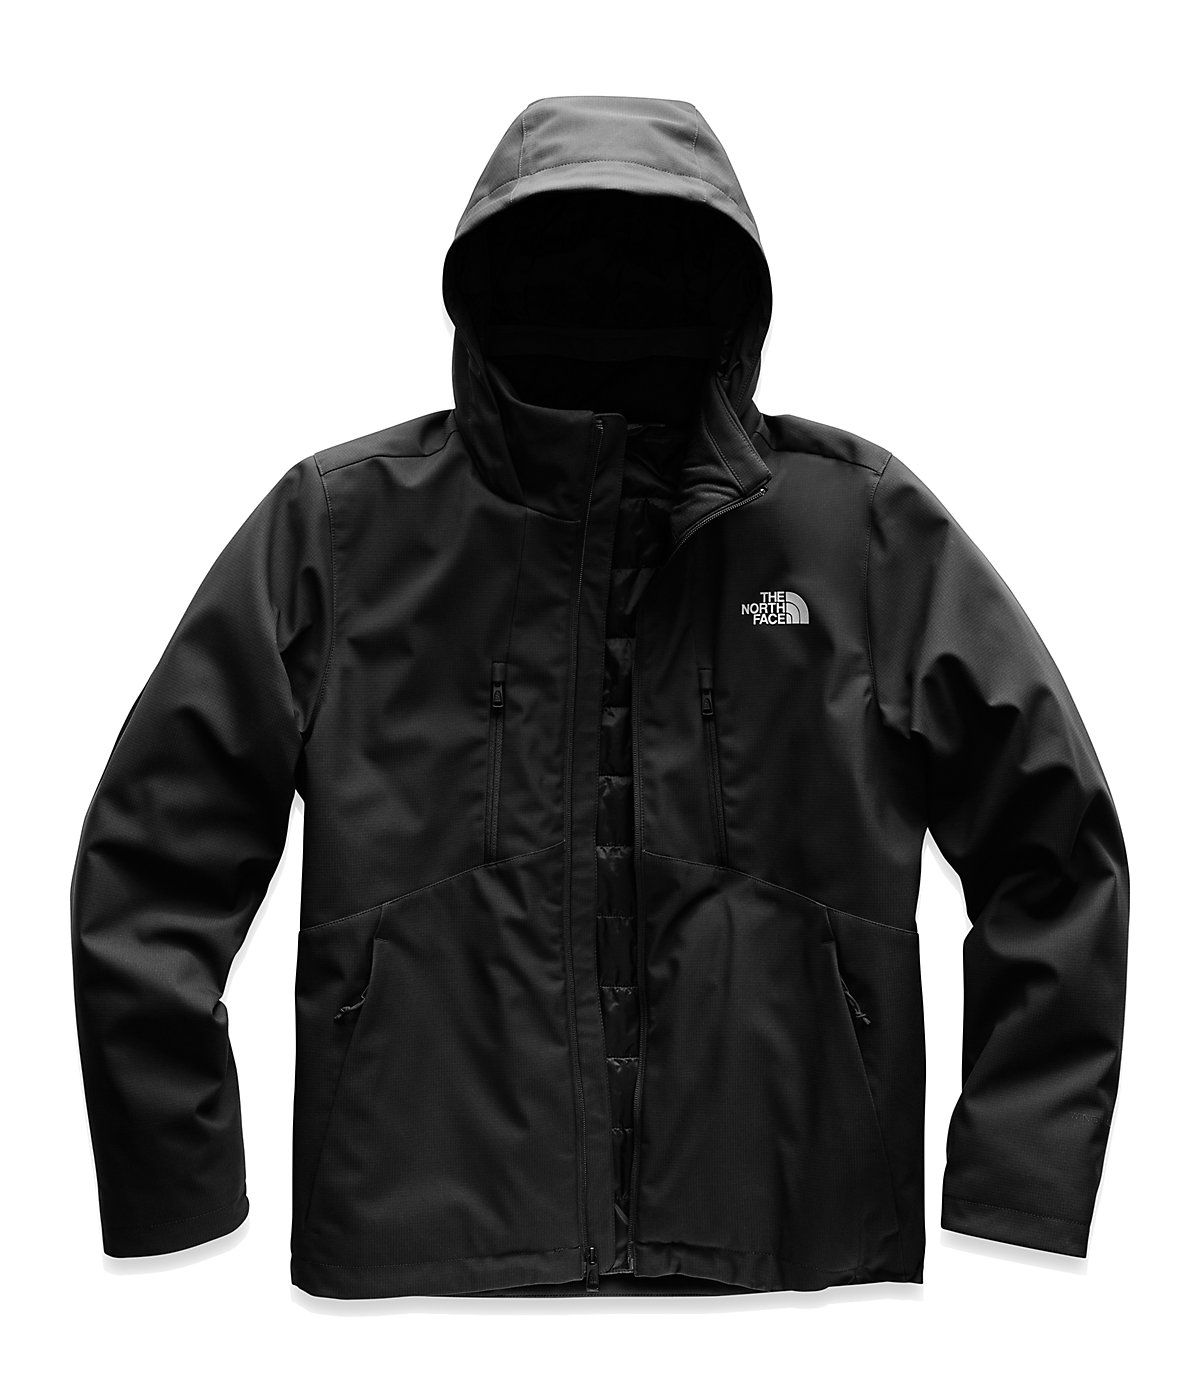 3028e3e874bd The North Face Men s Apex Elevation Jacket